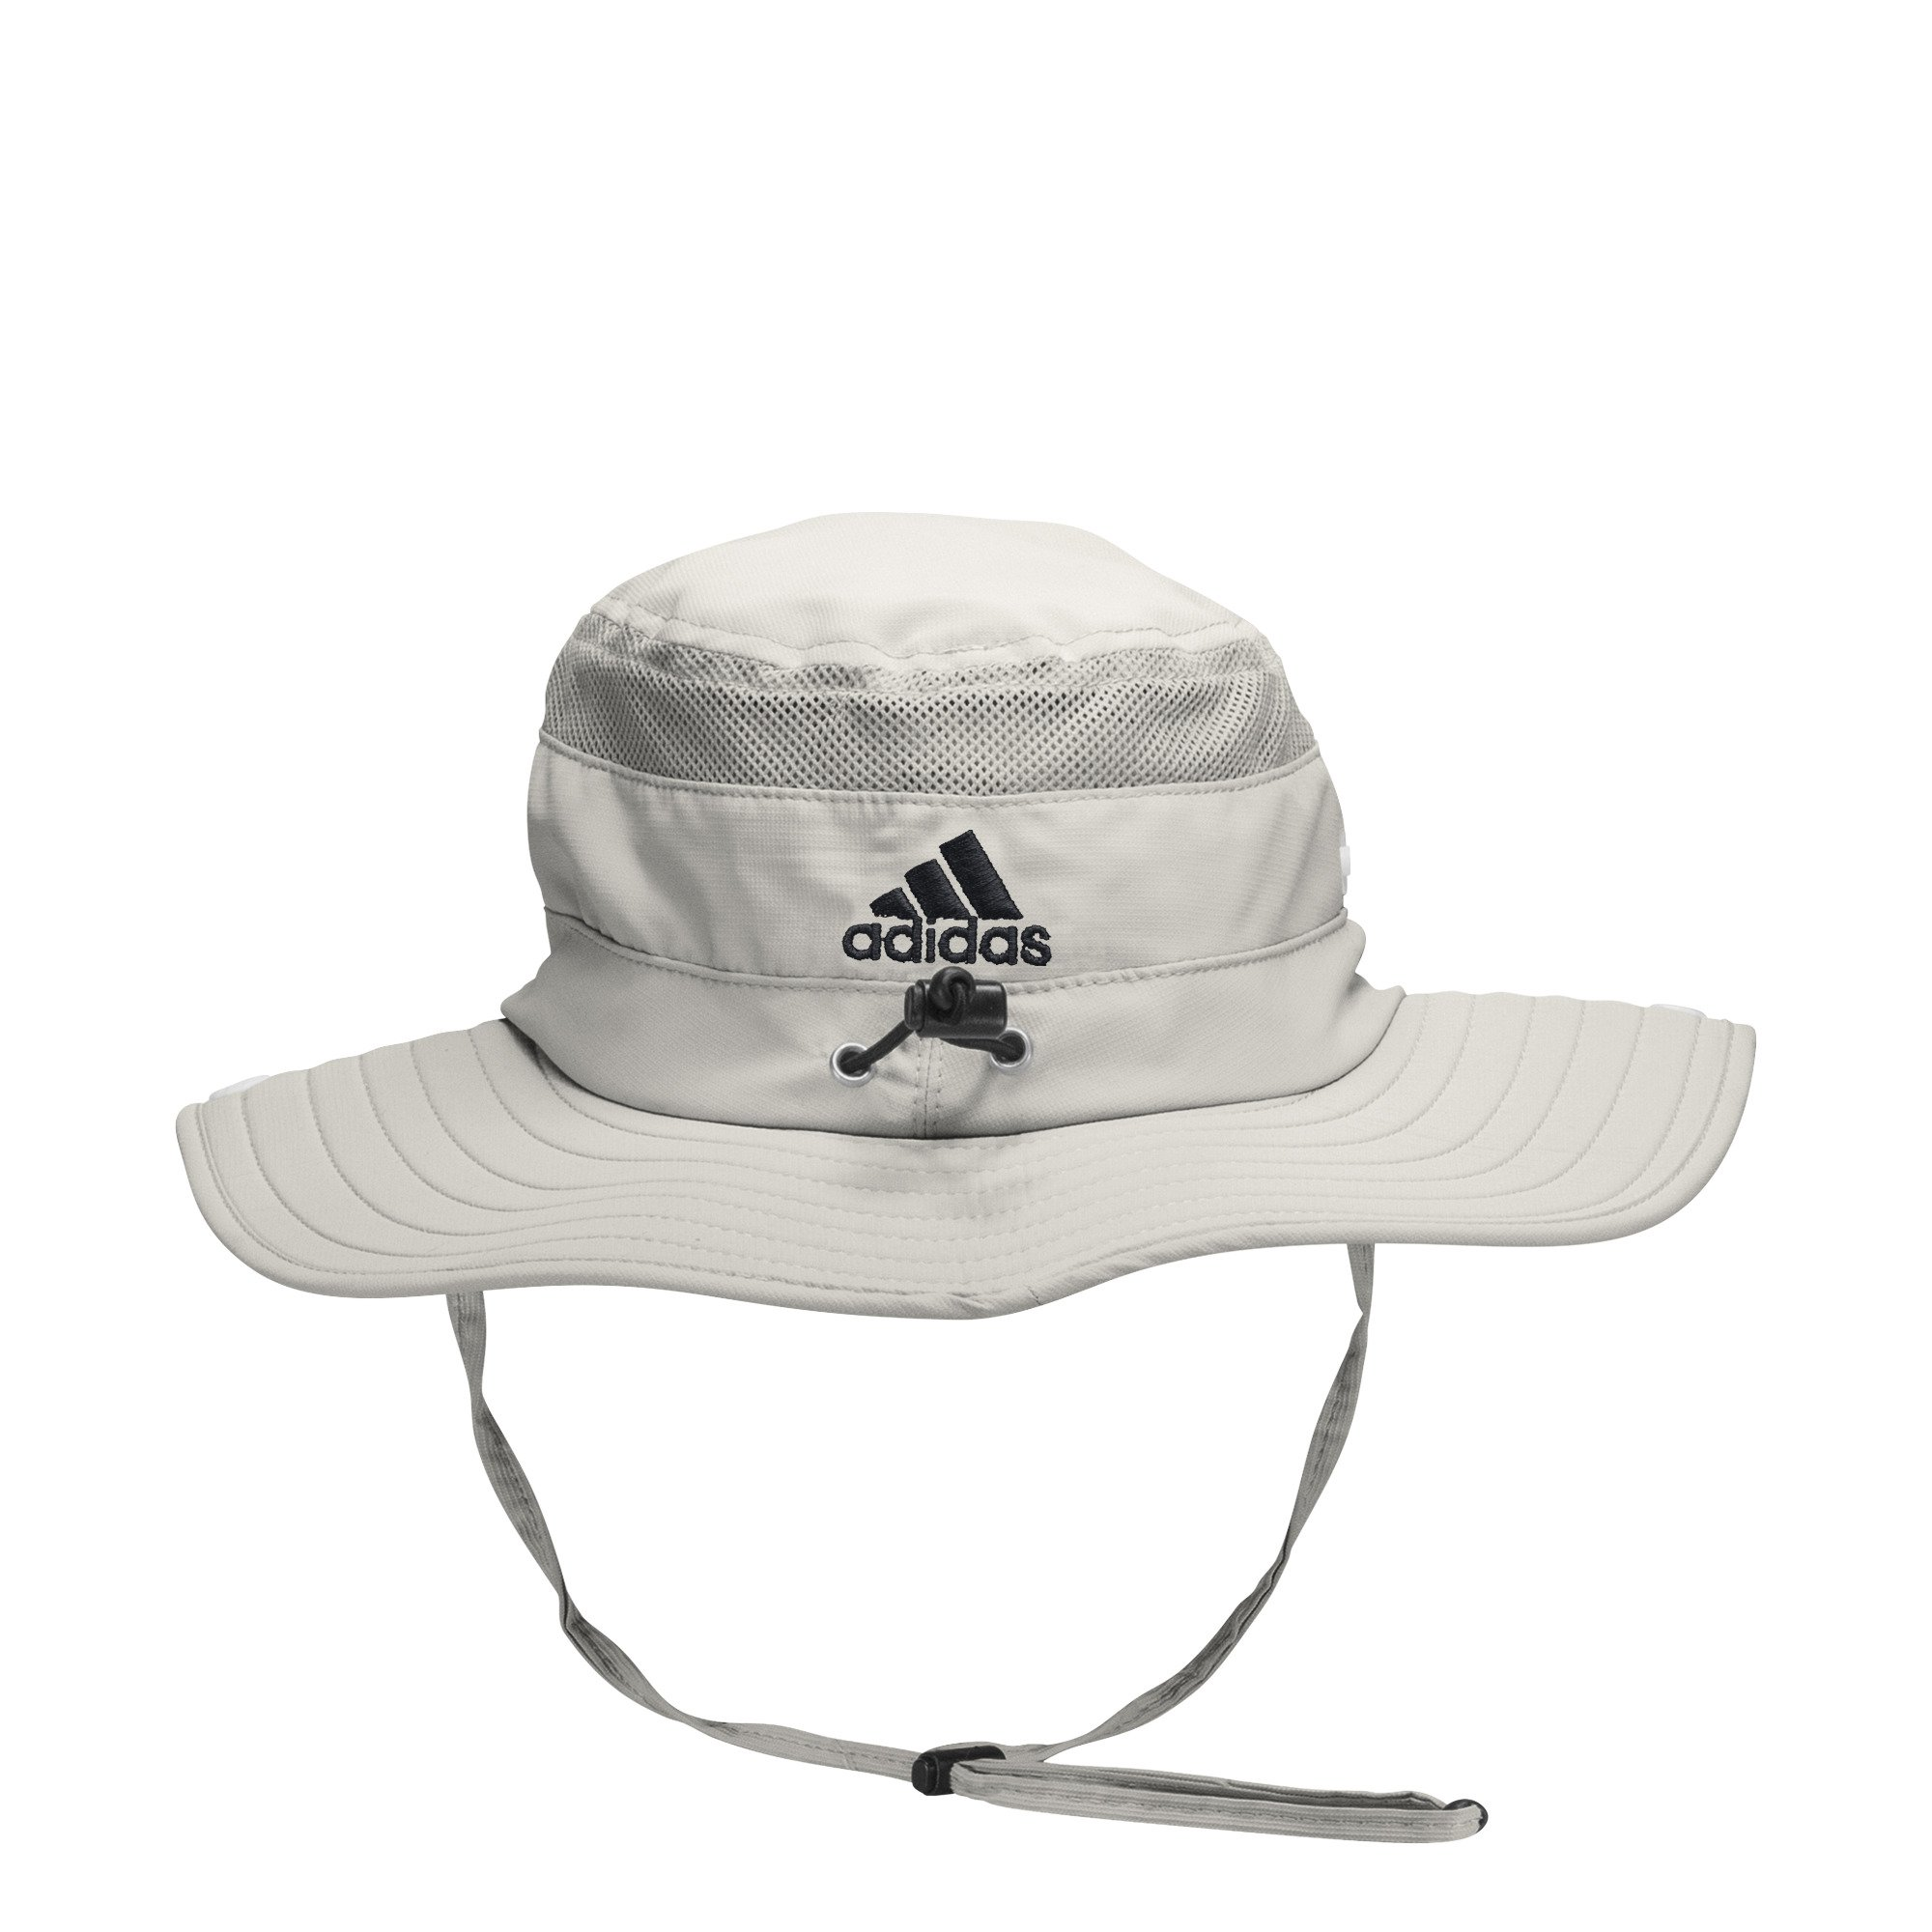 designer fashion 4b4a7 35549 Miami Hurricanes adidas Safari Hat - Tan